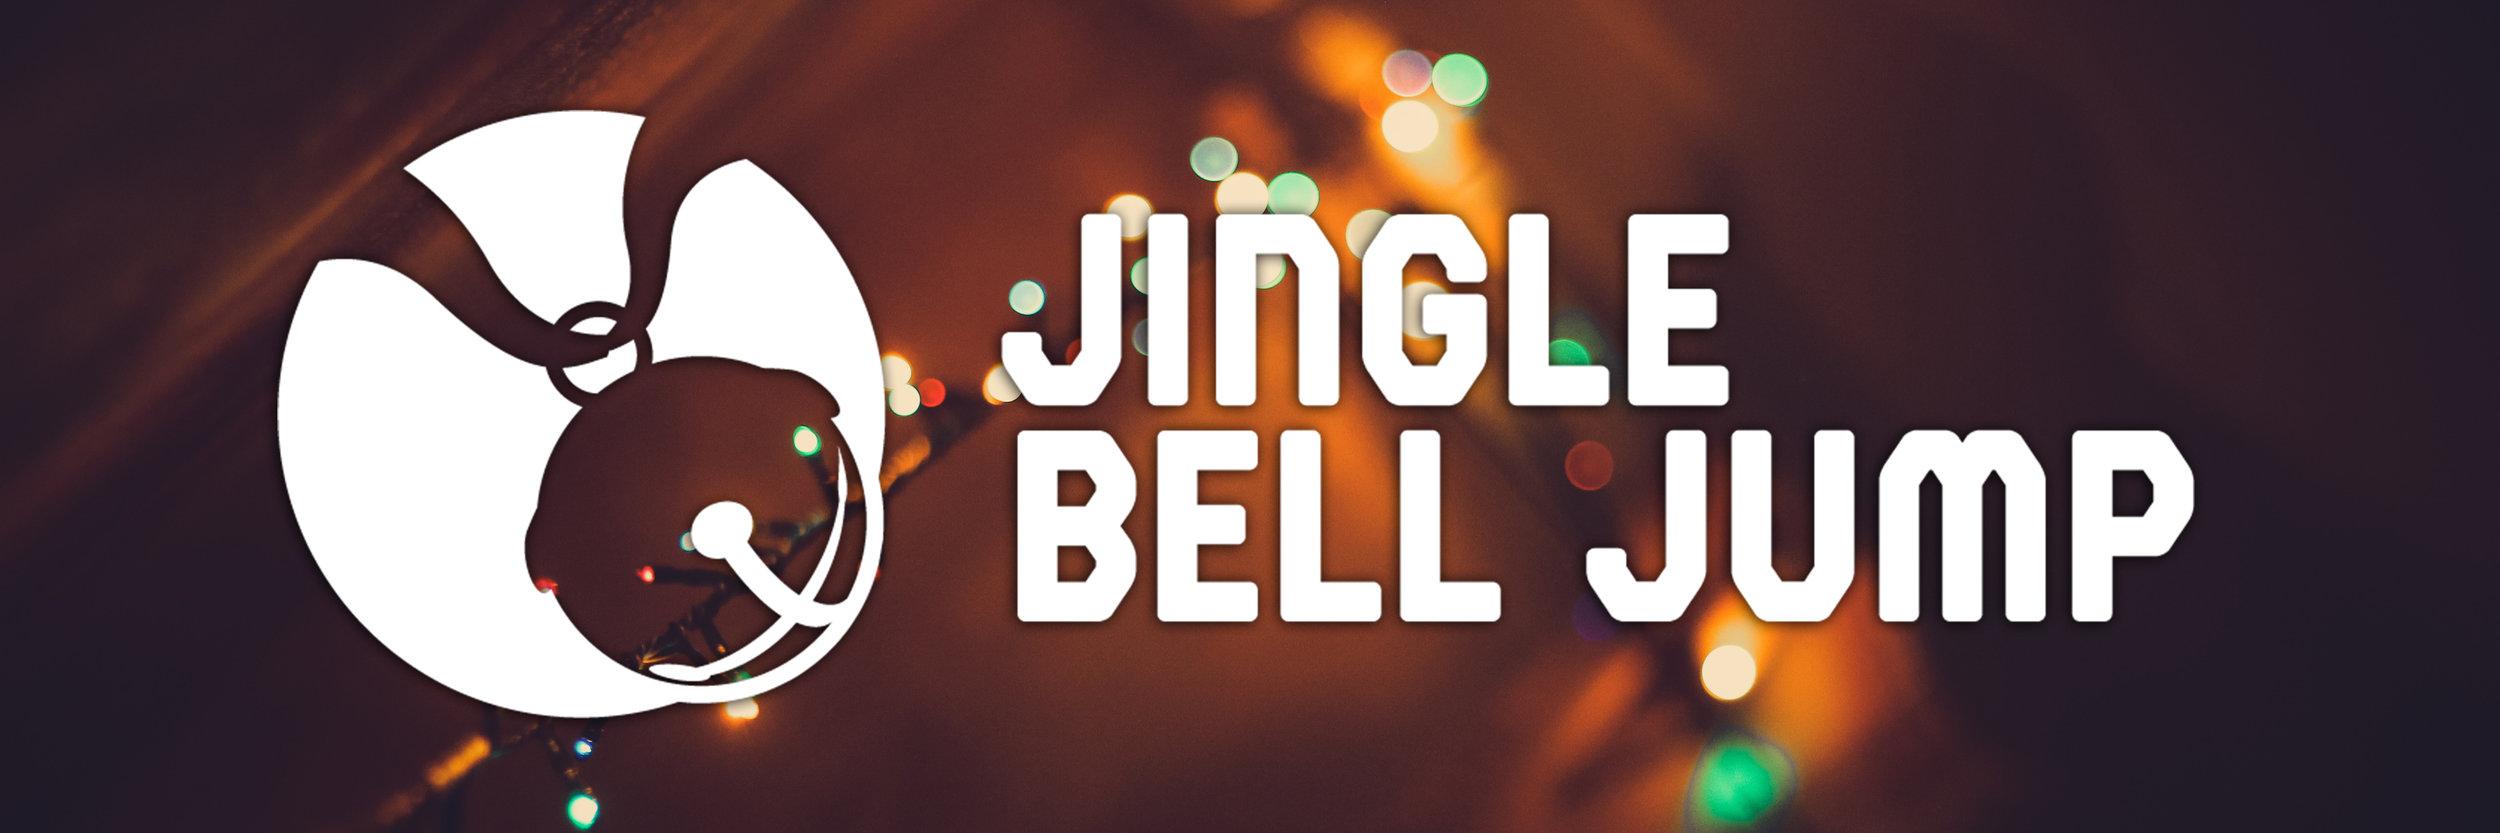 Jingle Bell Jump 3x1.jpg